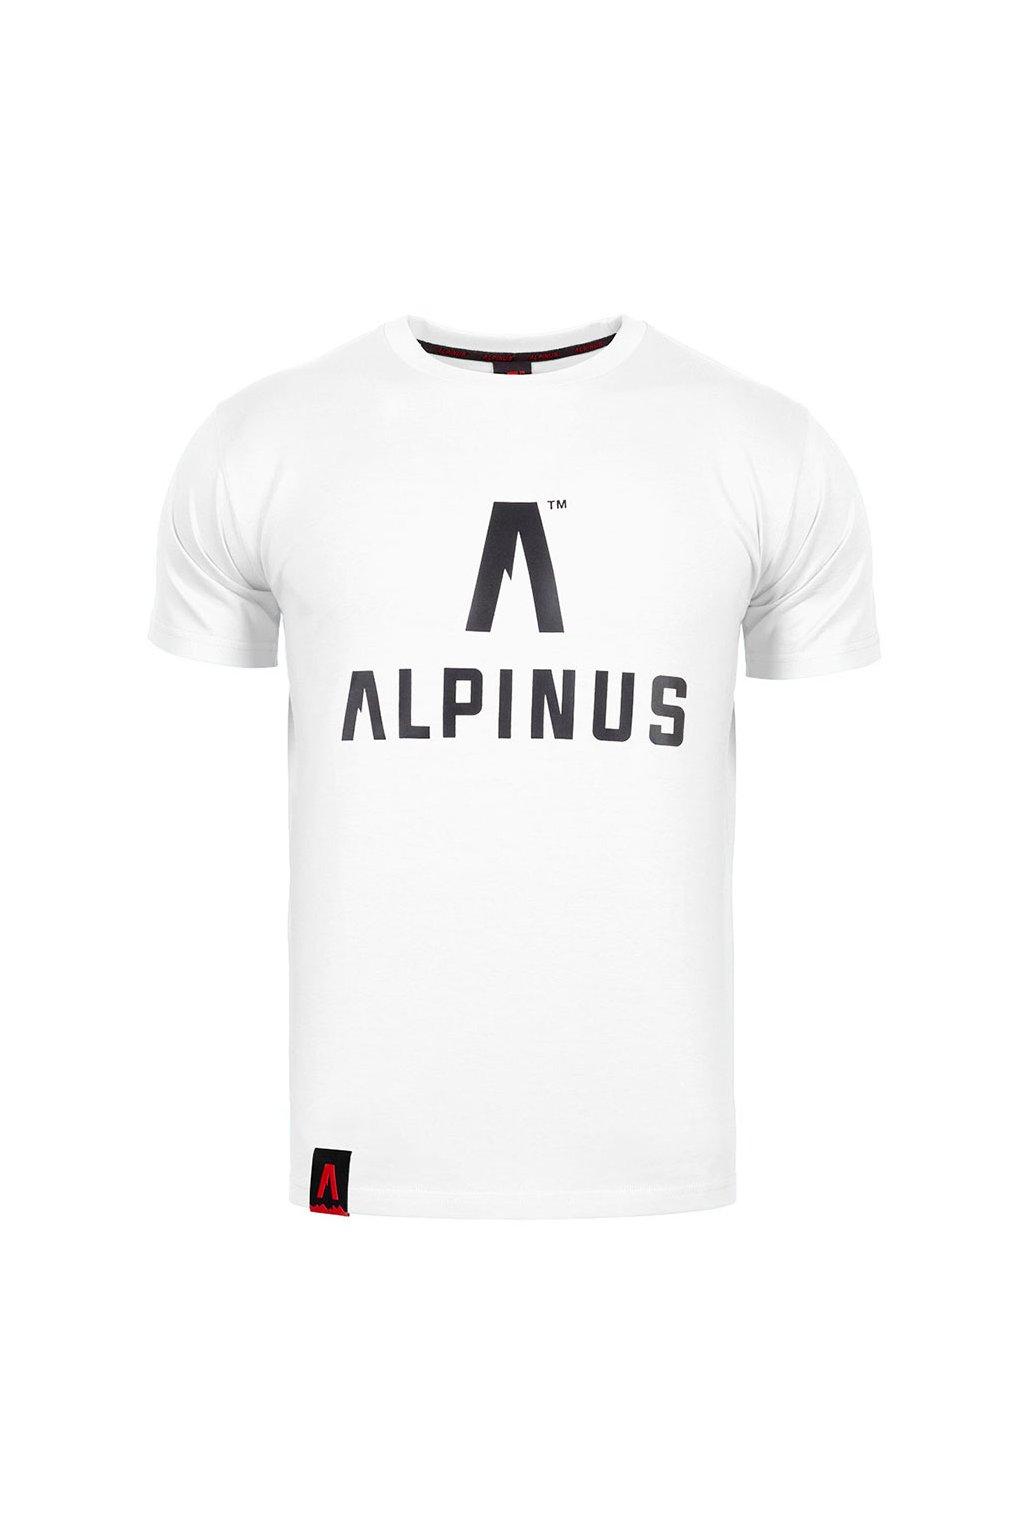 Pánske tričko Alpinus Classic biele ALP20TC0008